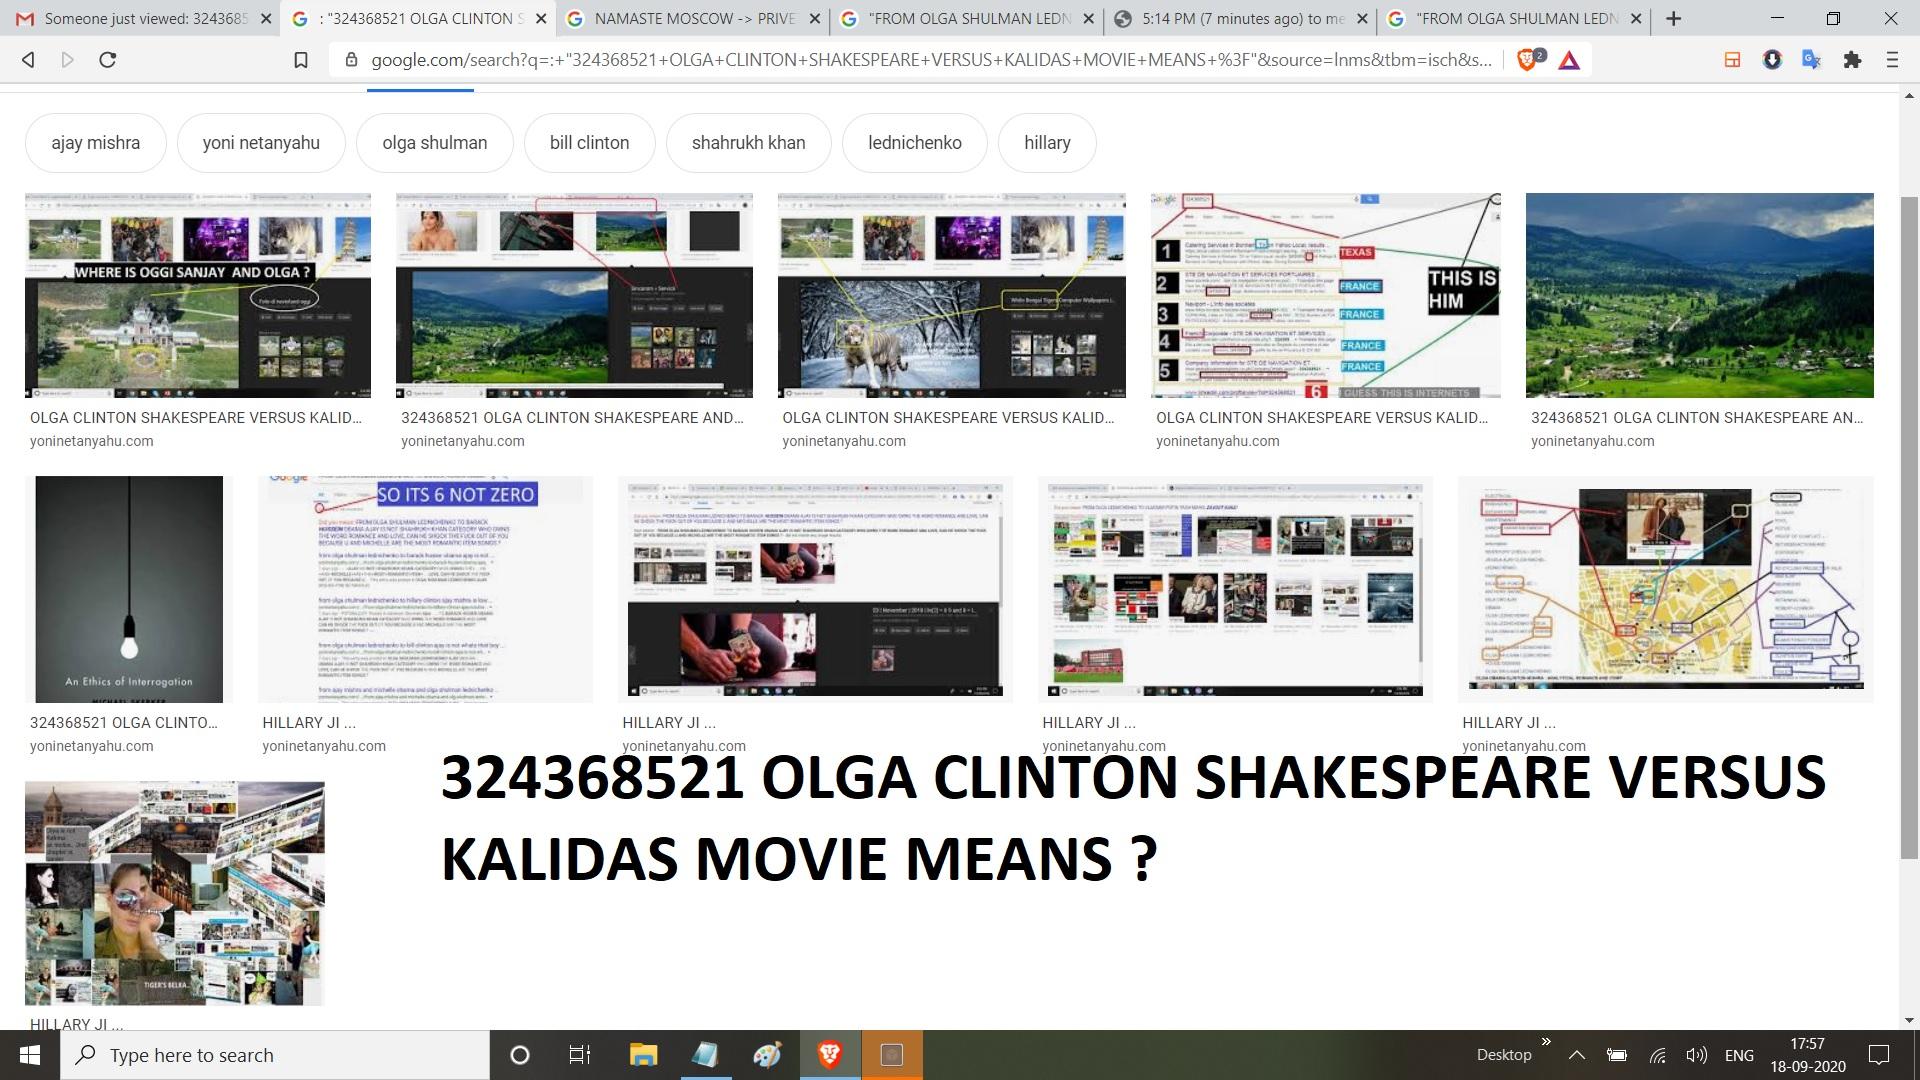 324368521 OLGA CLINTON SHAKESPEARE VERSUS KALIDAS MOVIE MEANS